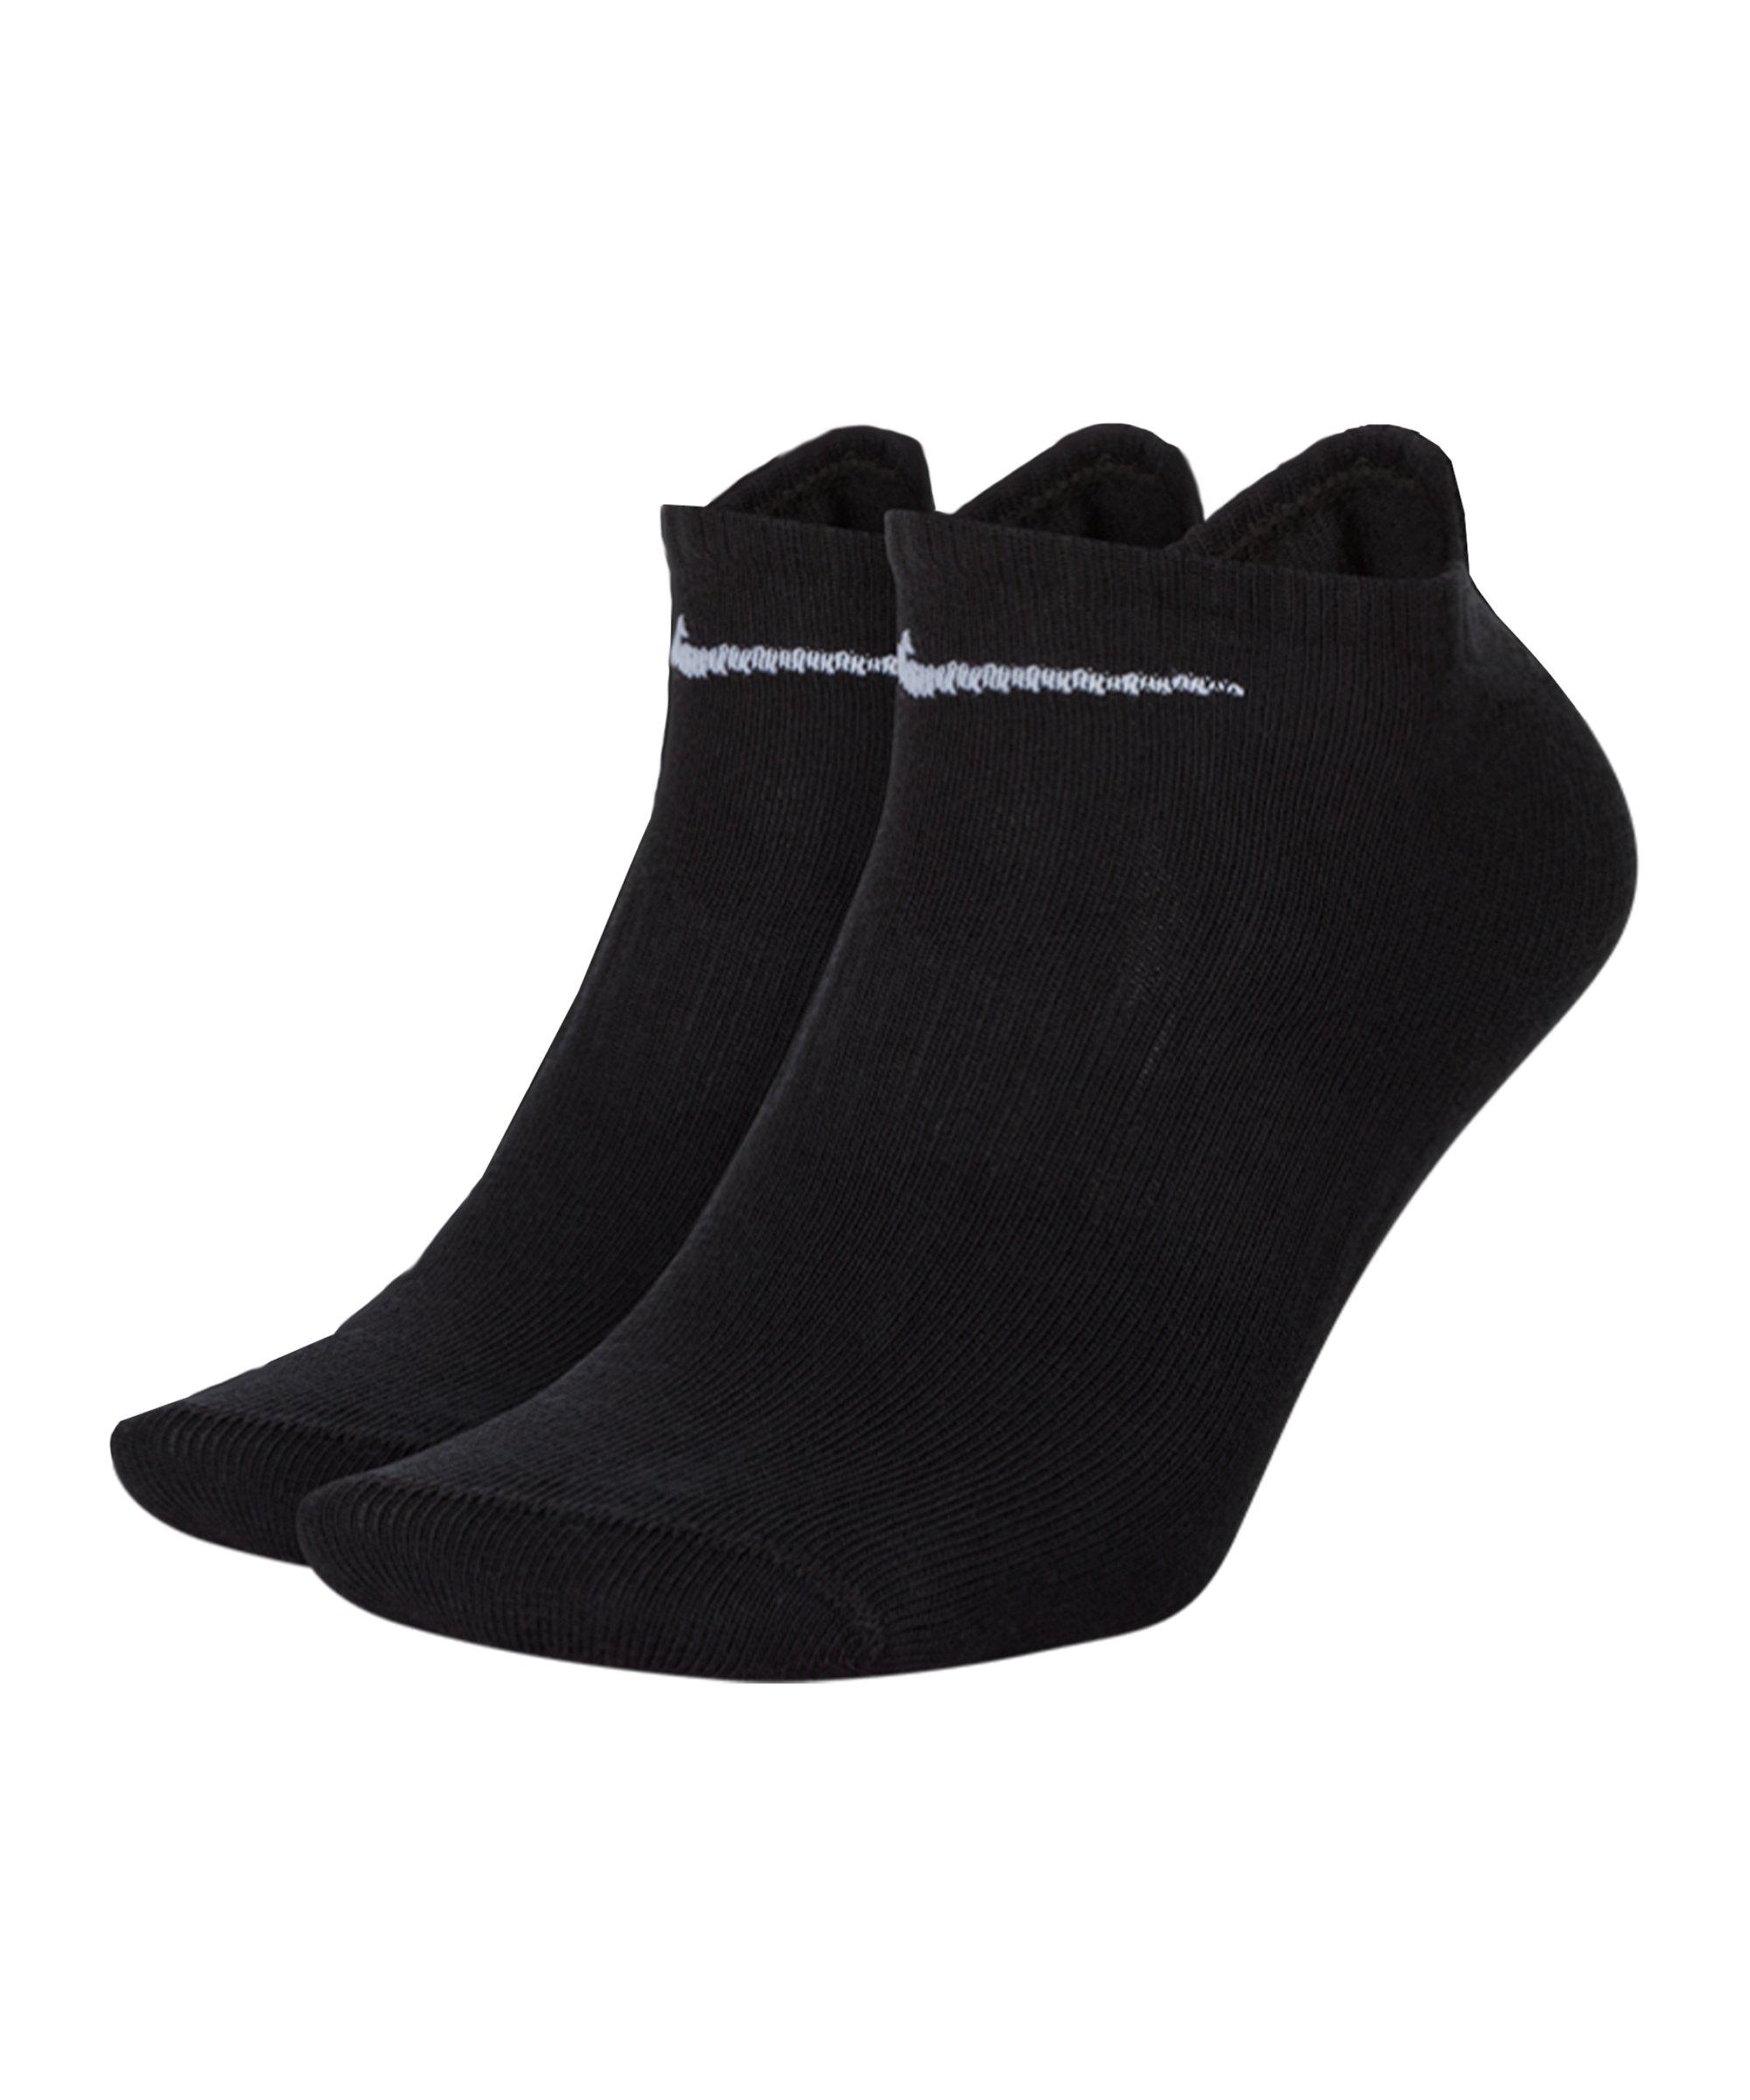 Nike Everyday Lightweight 6er Pack Füsslinge F010 - schwarz